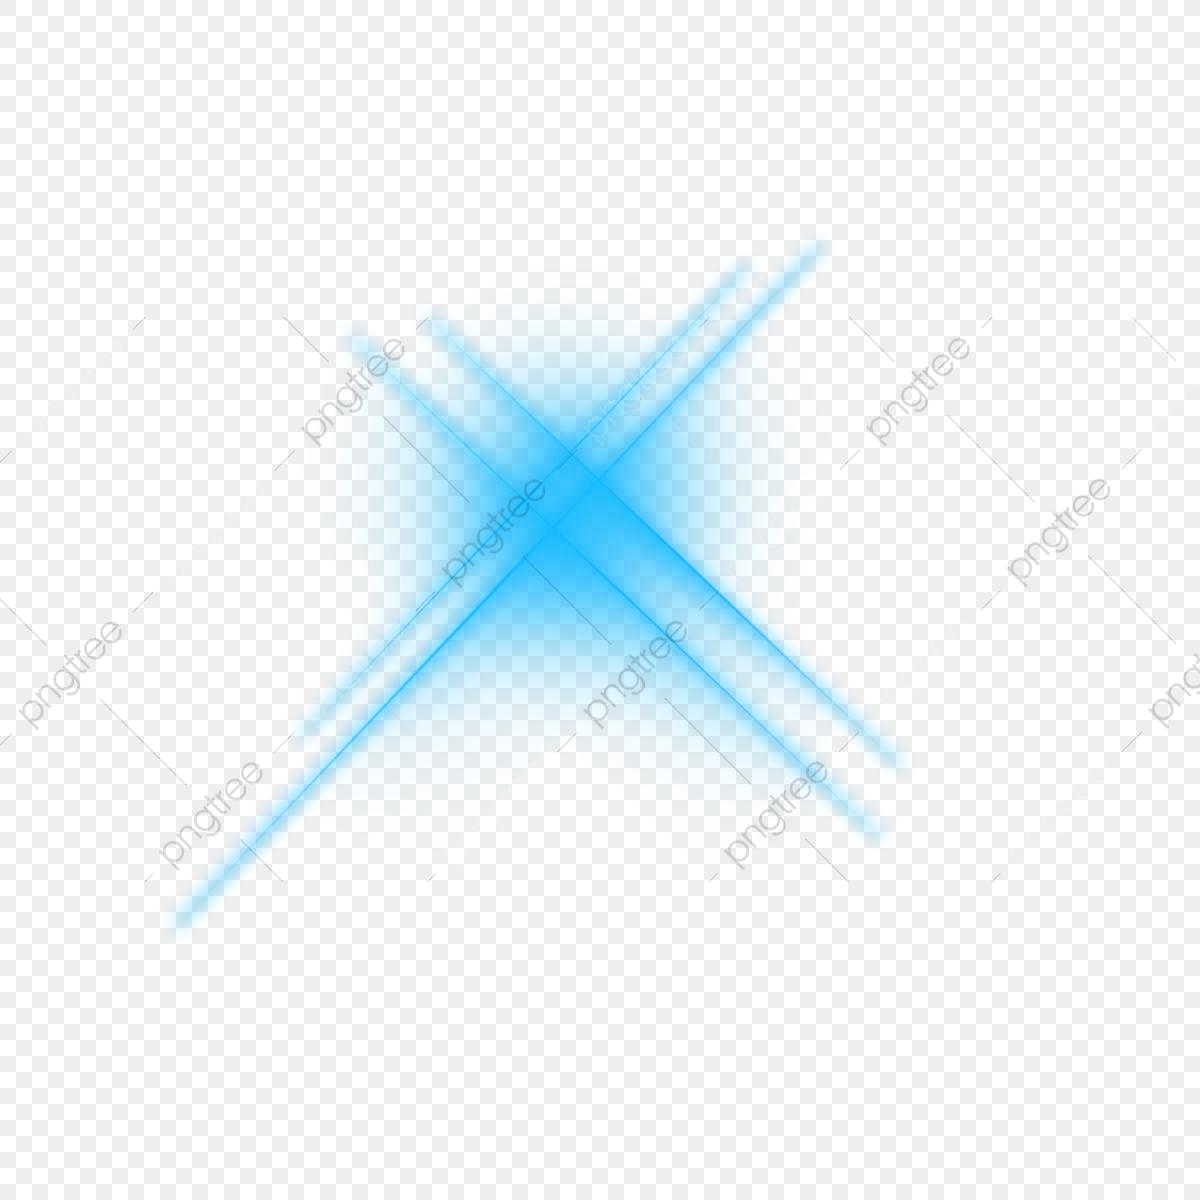 Stars Png Transparent Template Psd, Stars Png Transparent, Real.